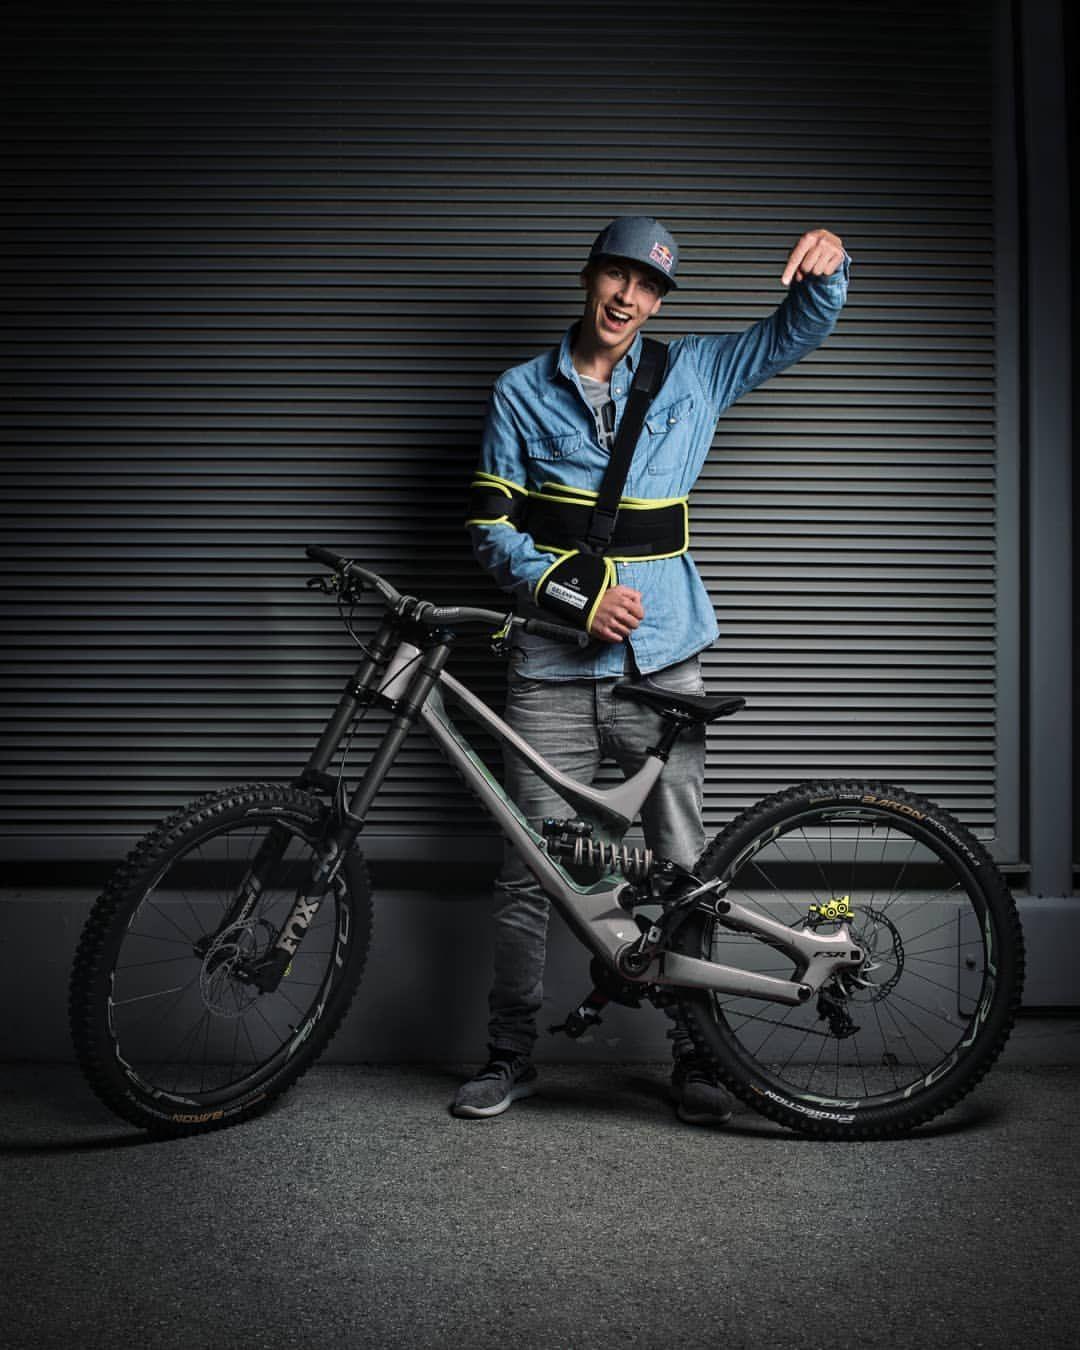 My Fabiolous Escape 2 Machine Can Anyone Guess The Colour Of My New Iamspecialized Mtb Demo Dow Downhill Bike Downhill Mountain Biking Freeride Mountain Bike